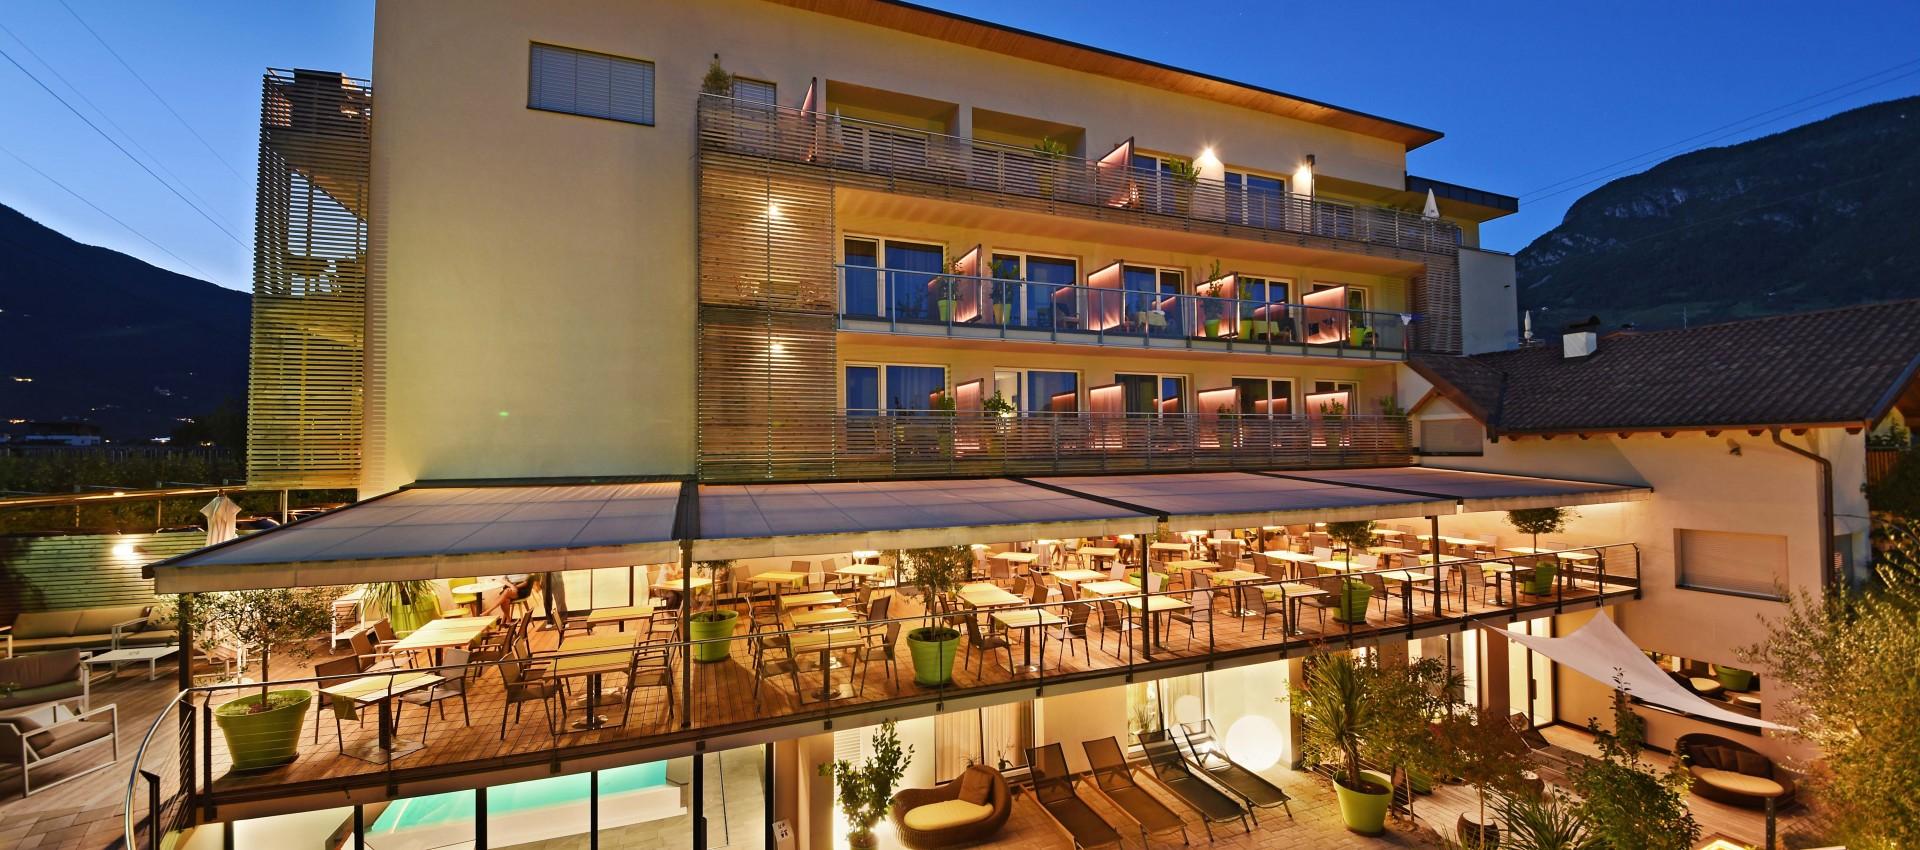 Hotel Pfeiss in Lana - Südtirol - Meran - Abendaufnahme